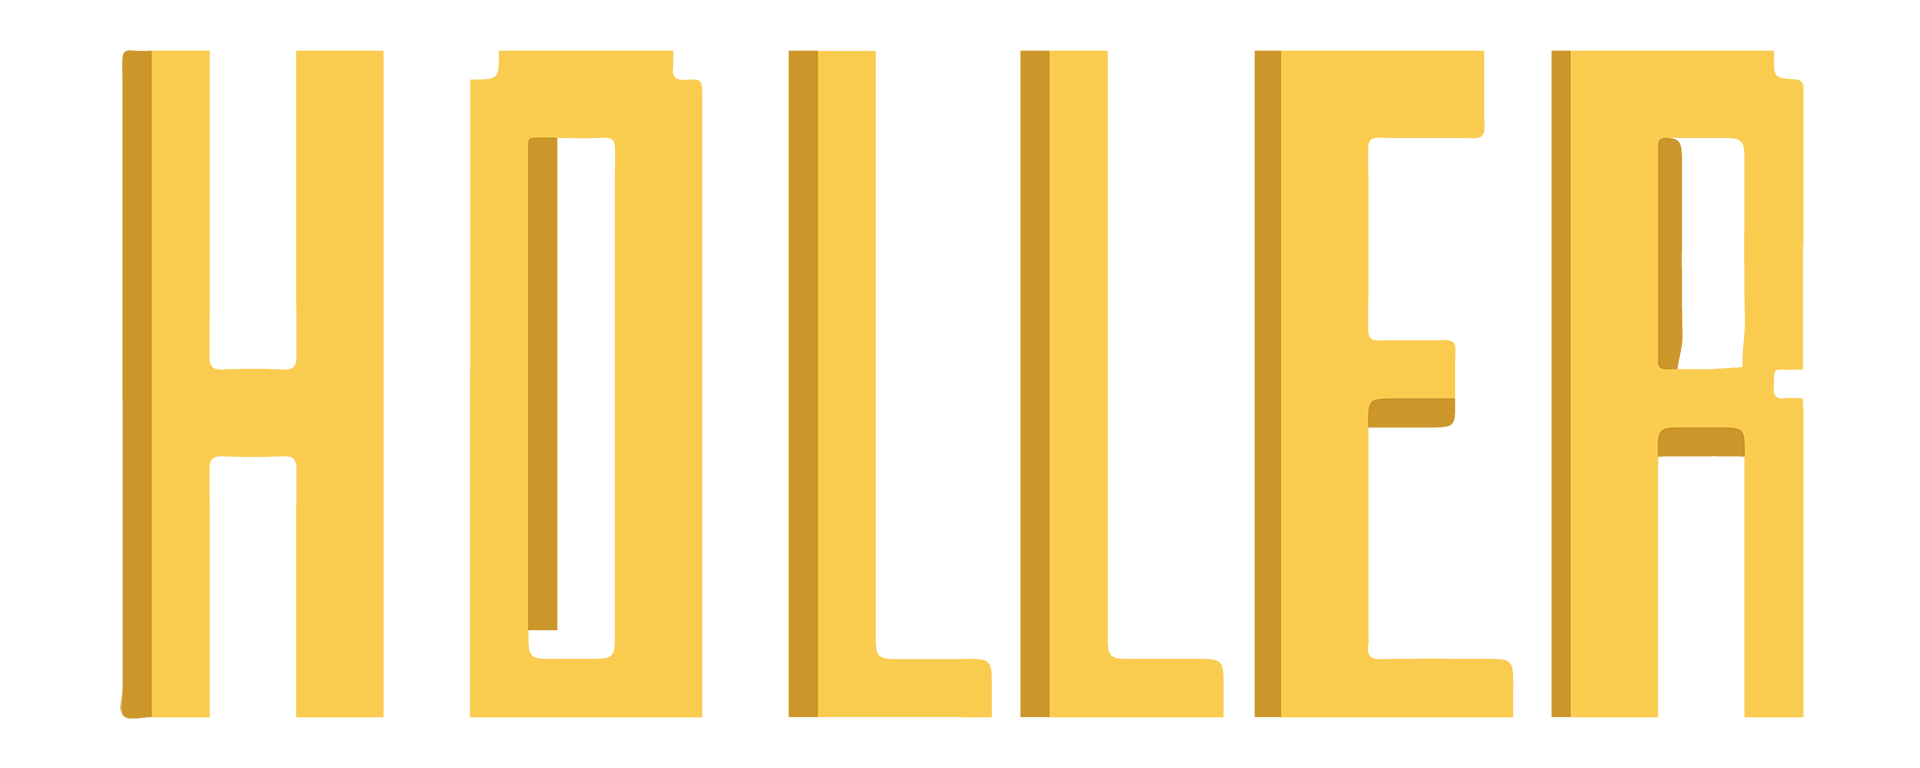 Holler Online Learning